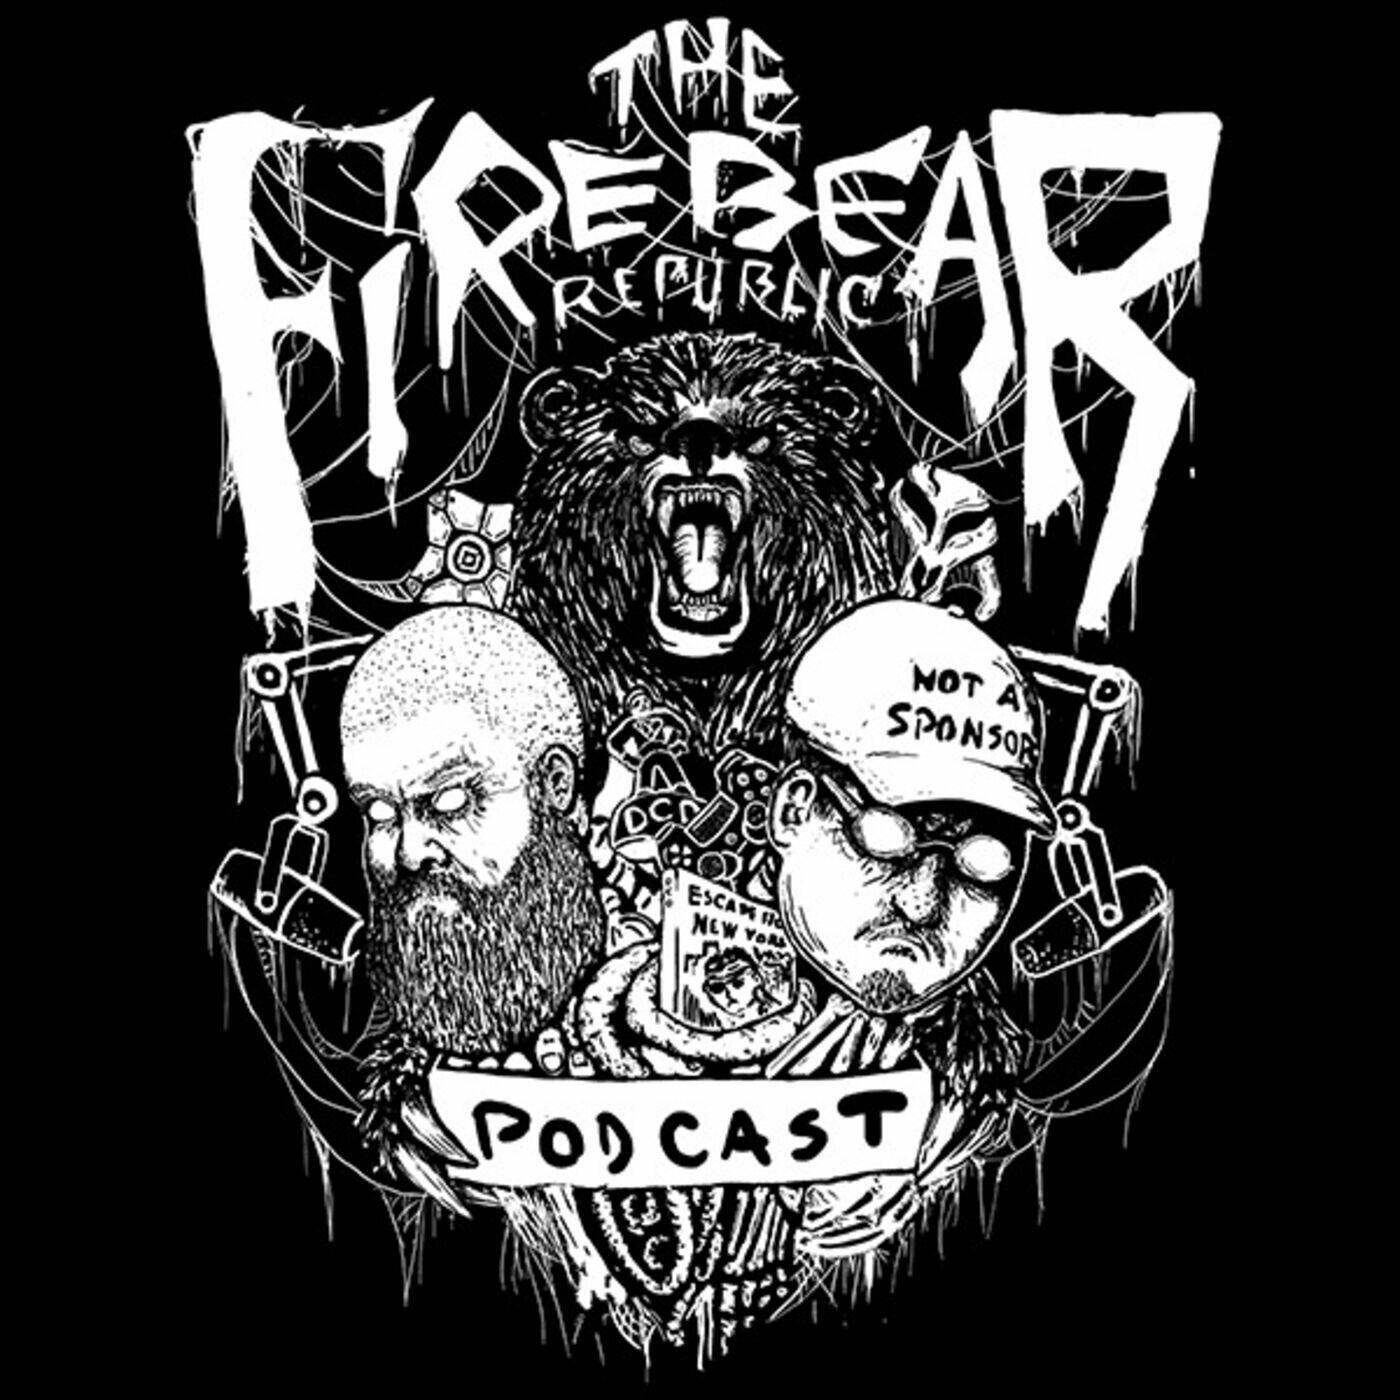 The Firebear Republic